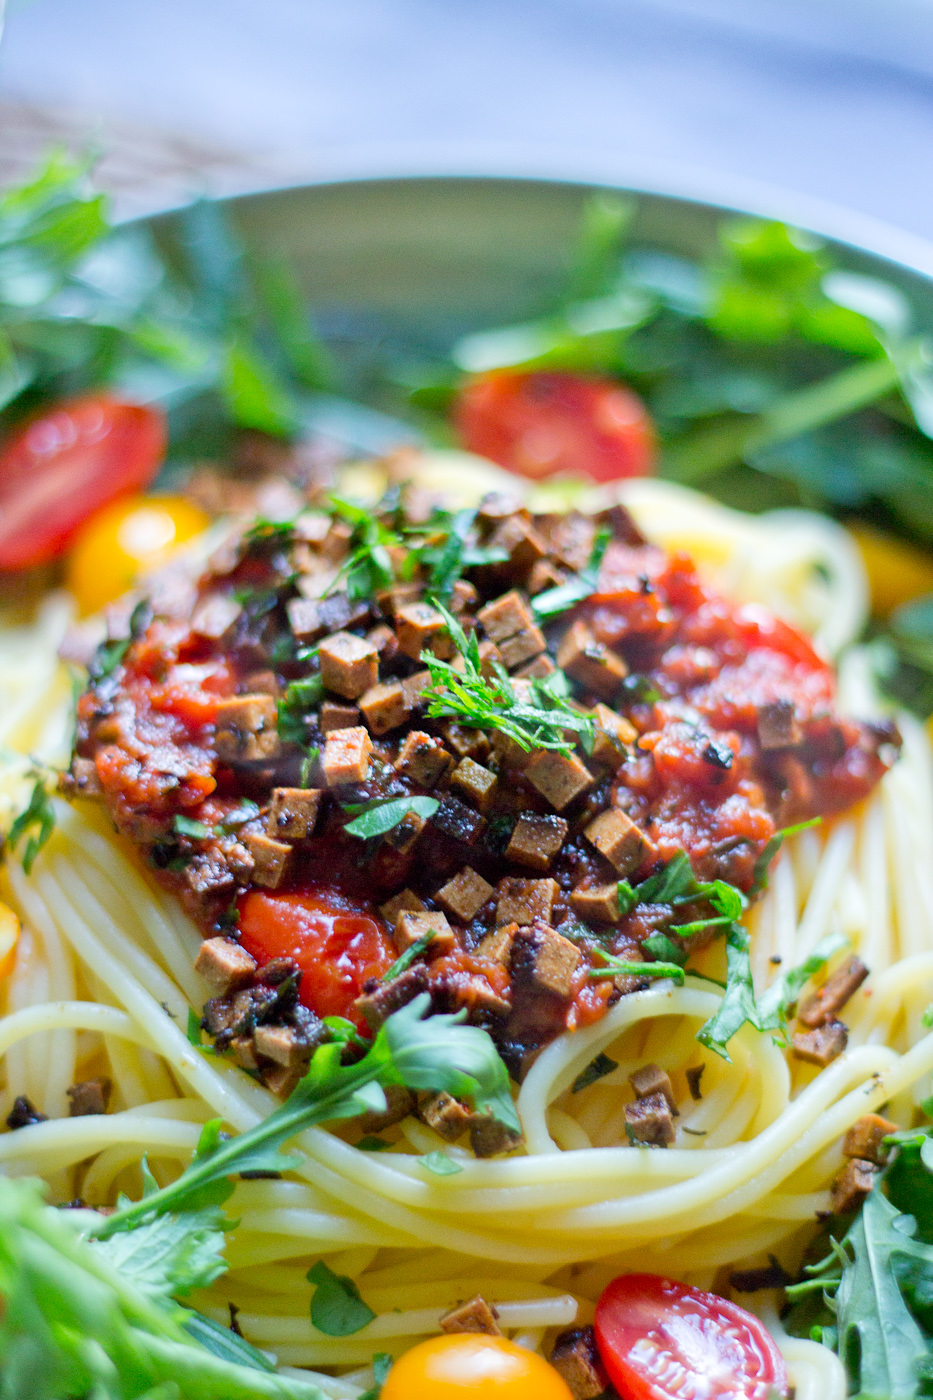 Fakon topping on gluten free corn spaghetti with tomato sauce.